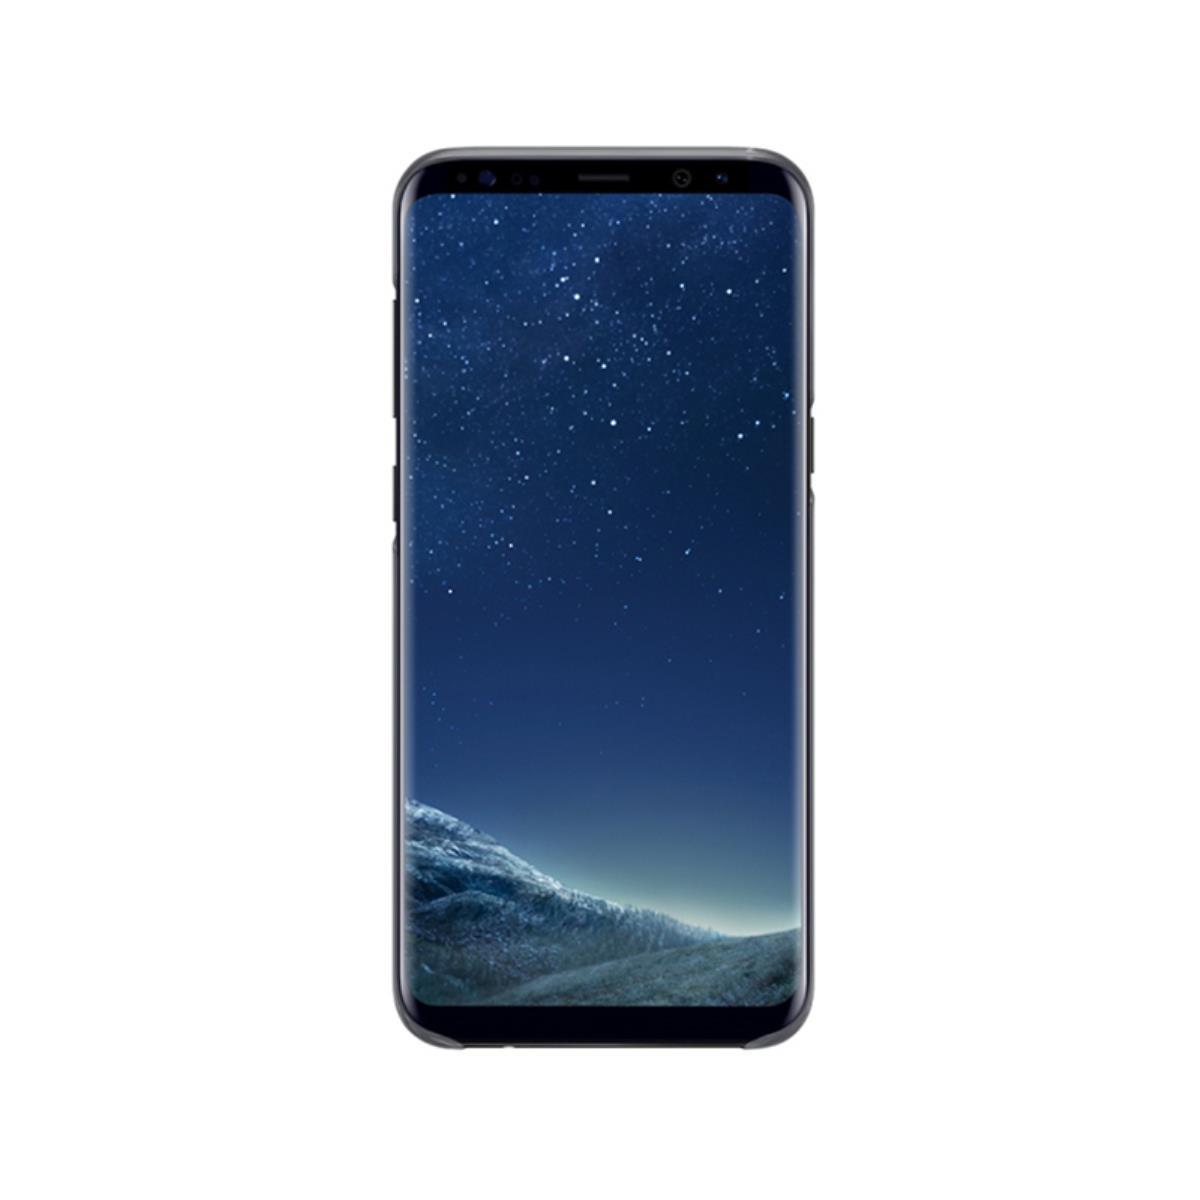 TEMPERED GLASS FILLM IPHONE 7 PLUS FULL SCREEN BLACK